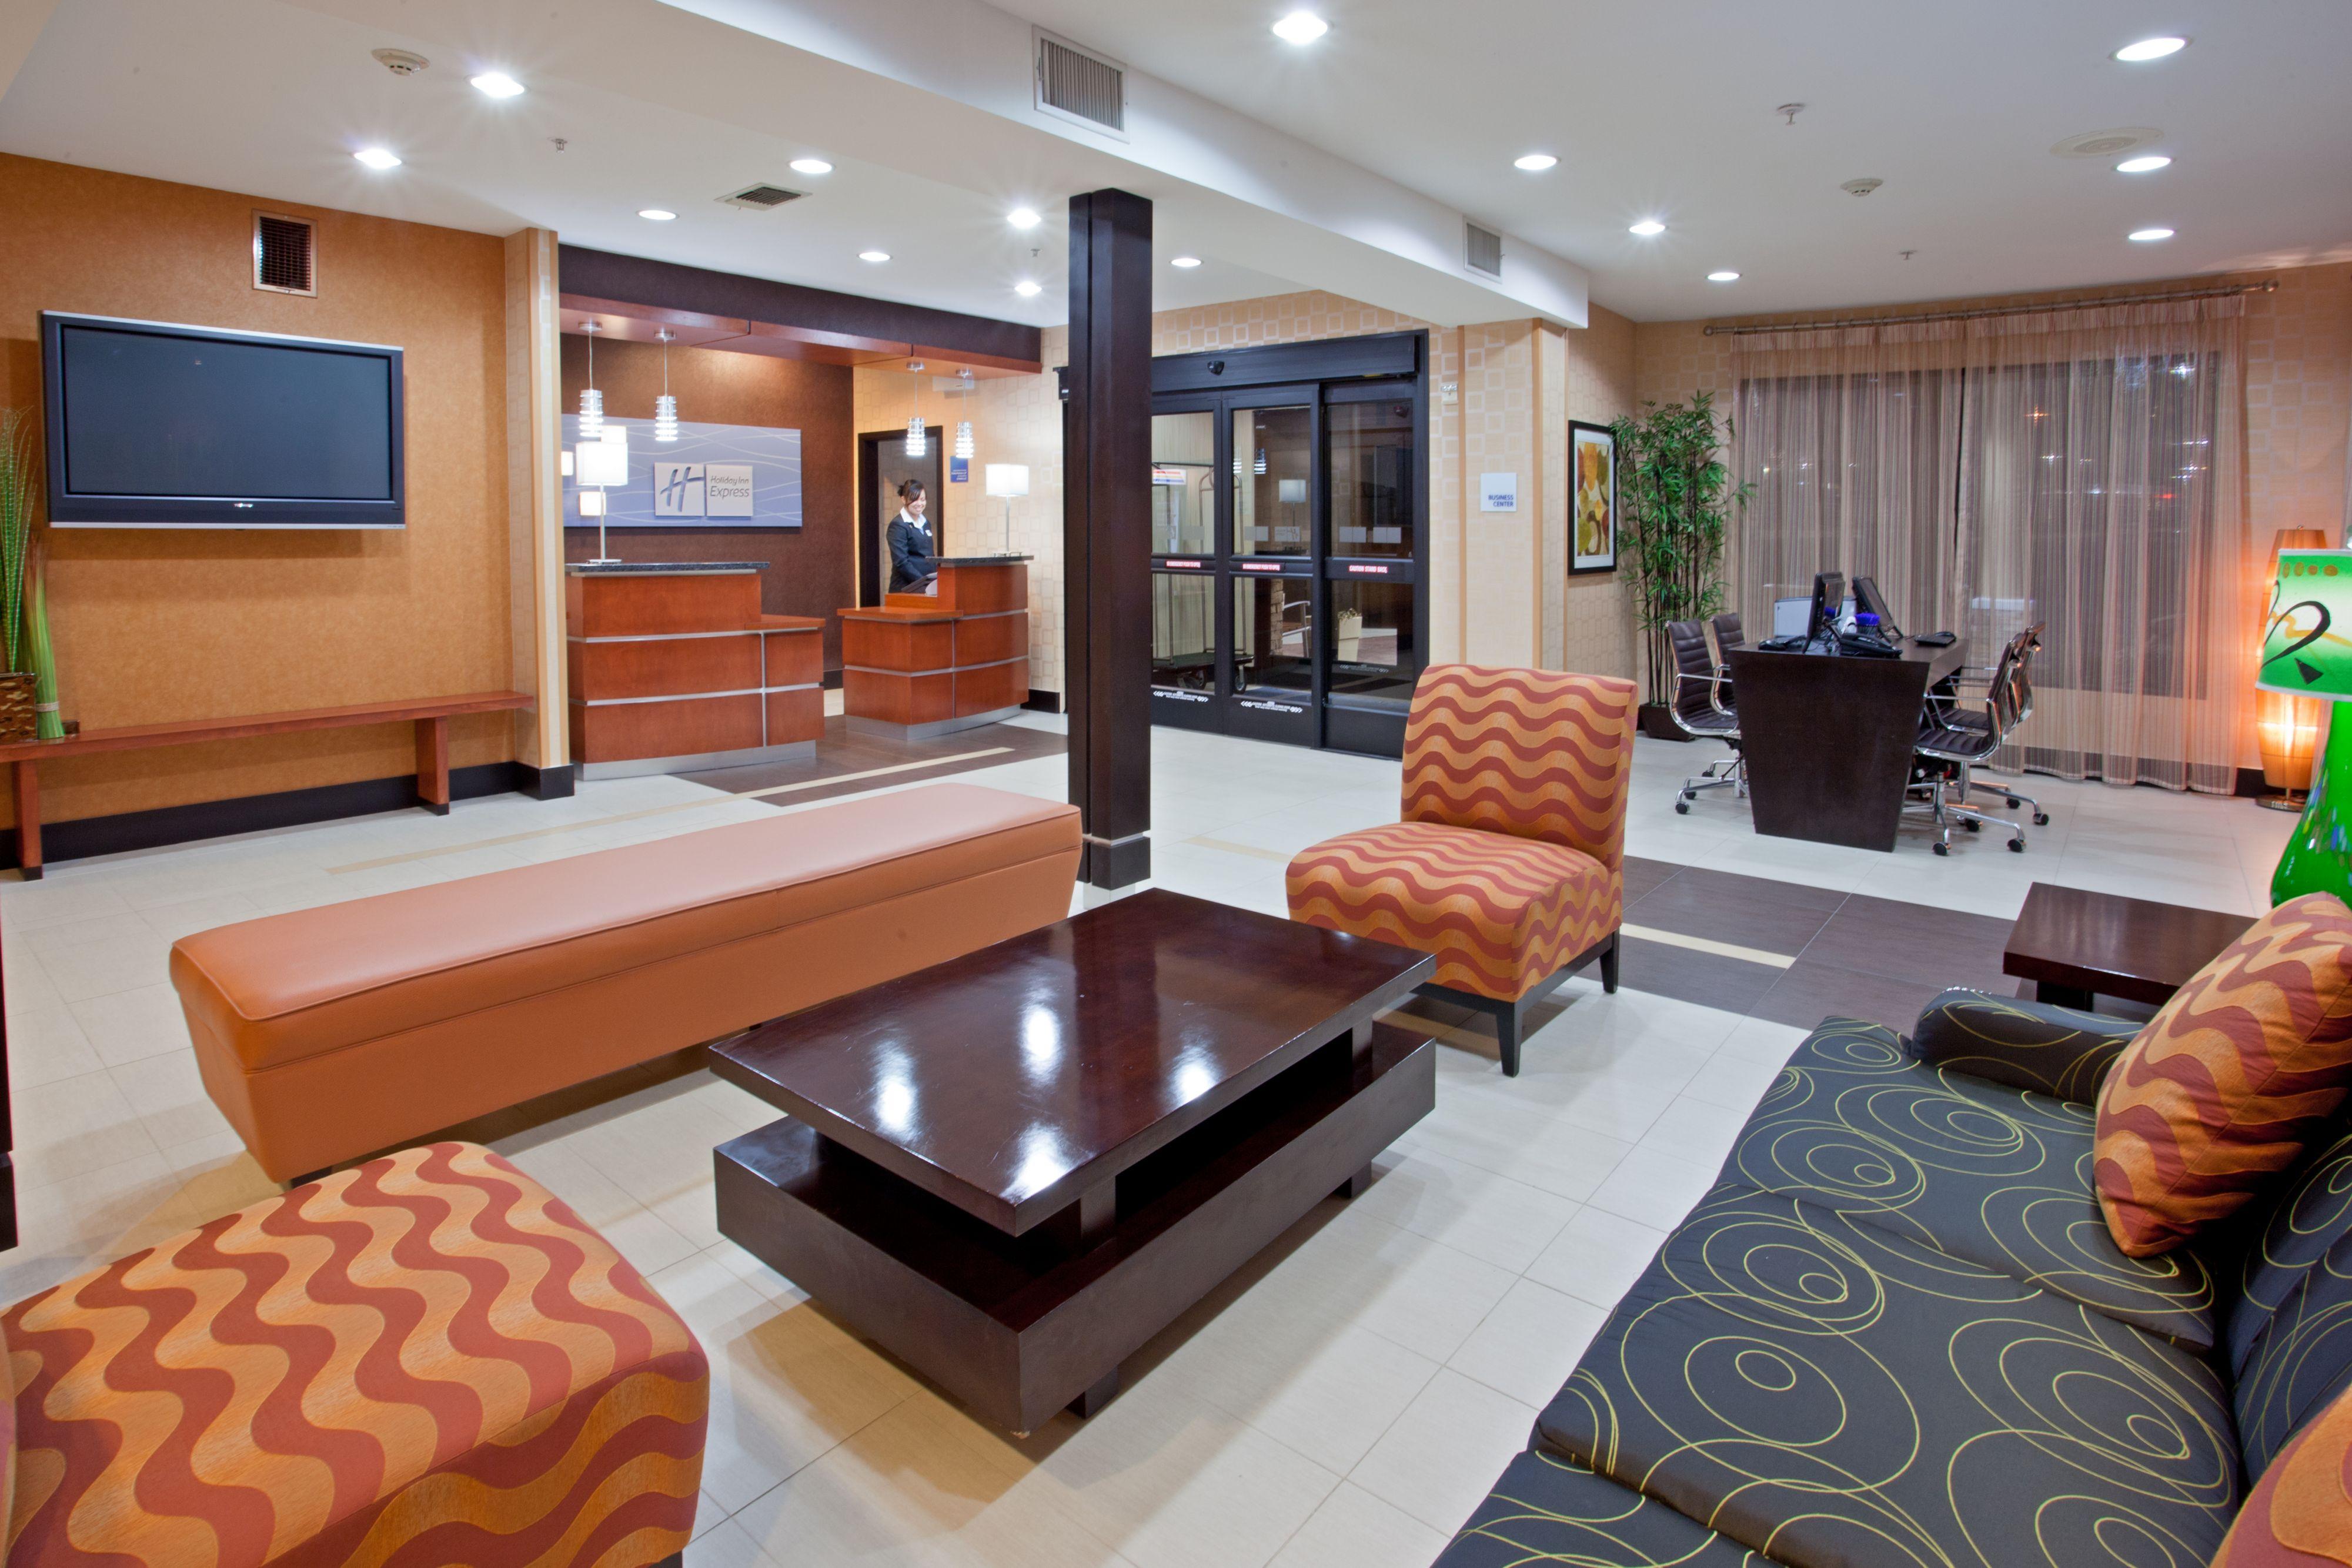 Holiday Inn Express & Suites Arlington (I-20-Parks Mall) image 4